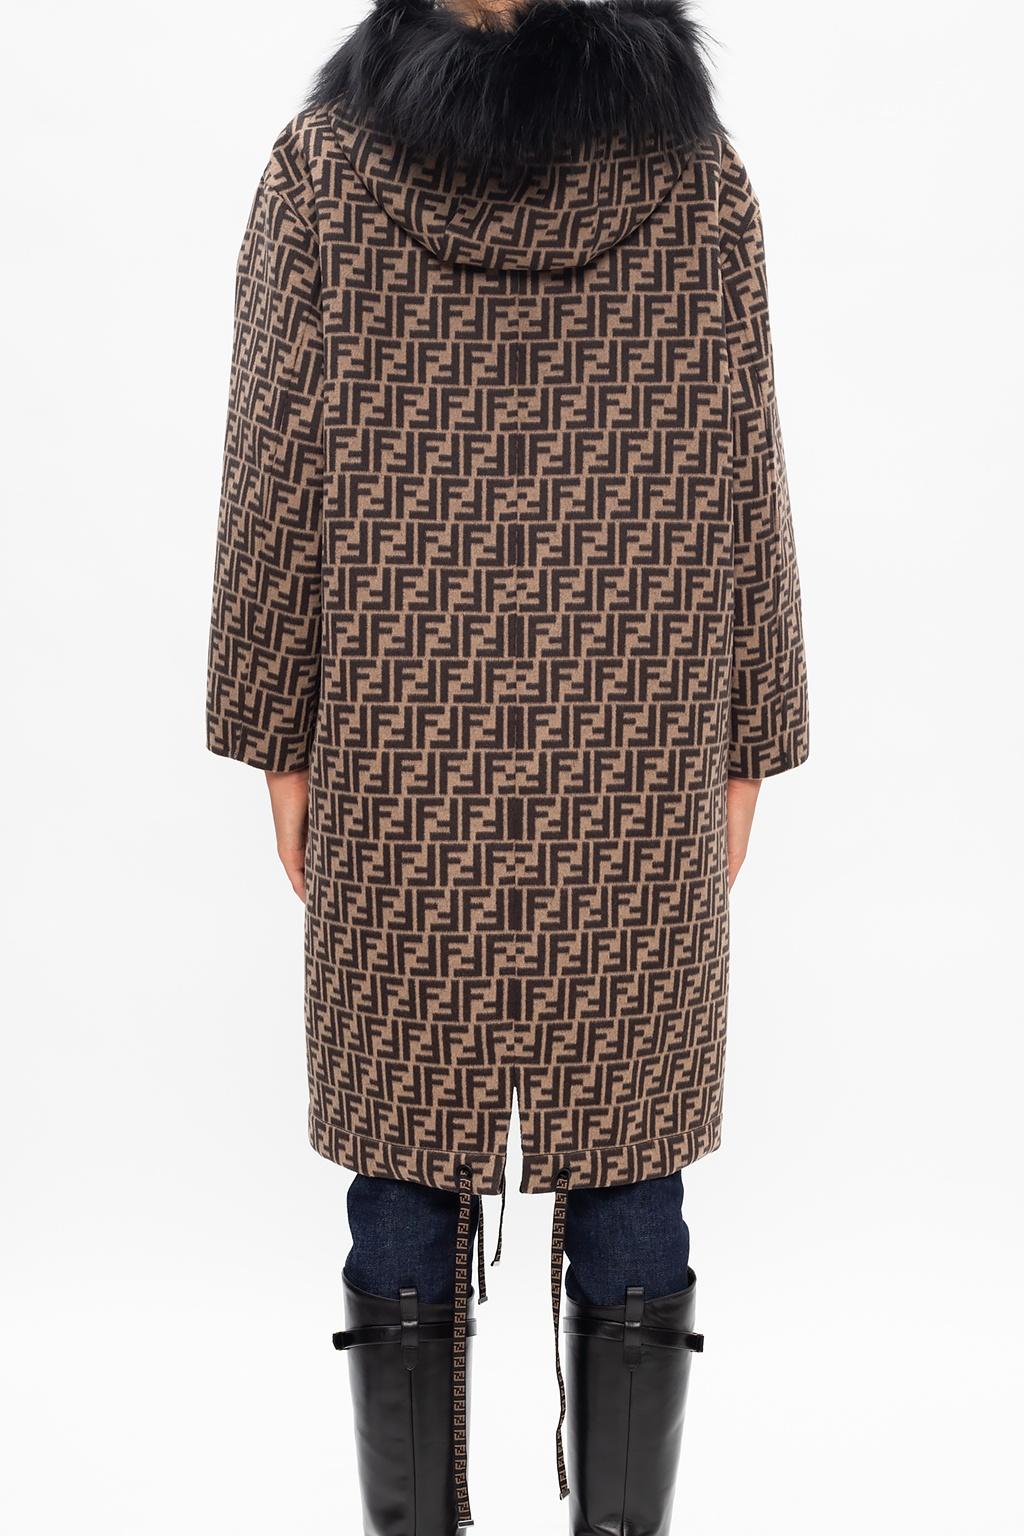 Fendi Reversible overcoat